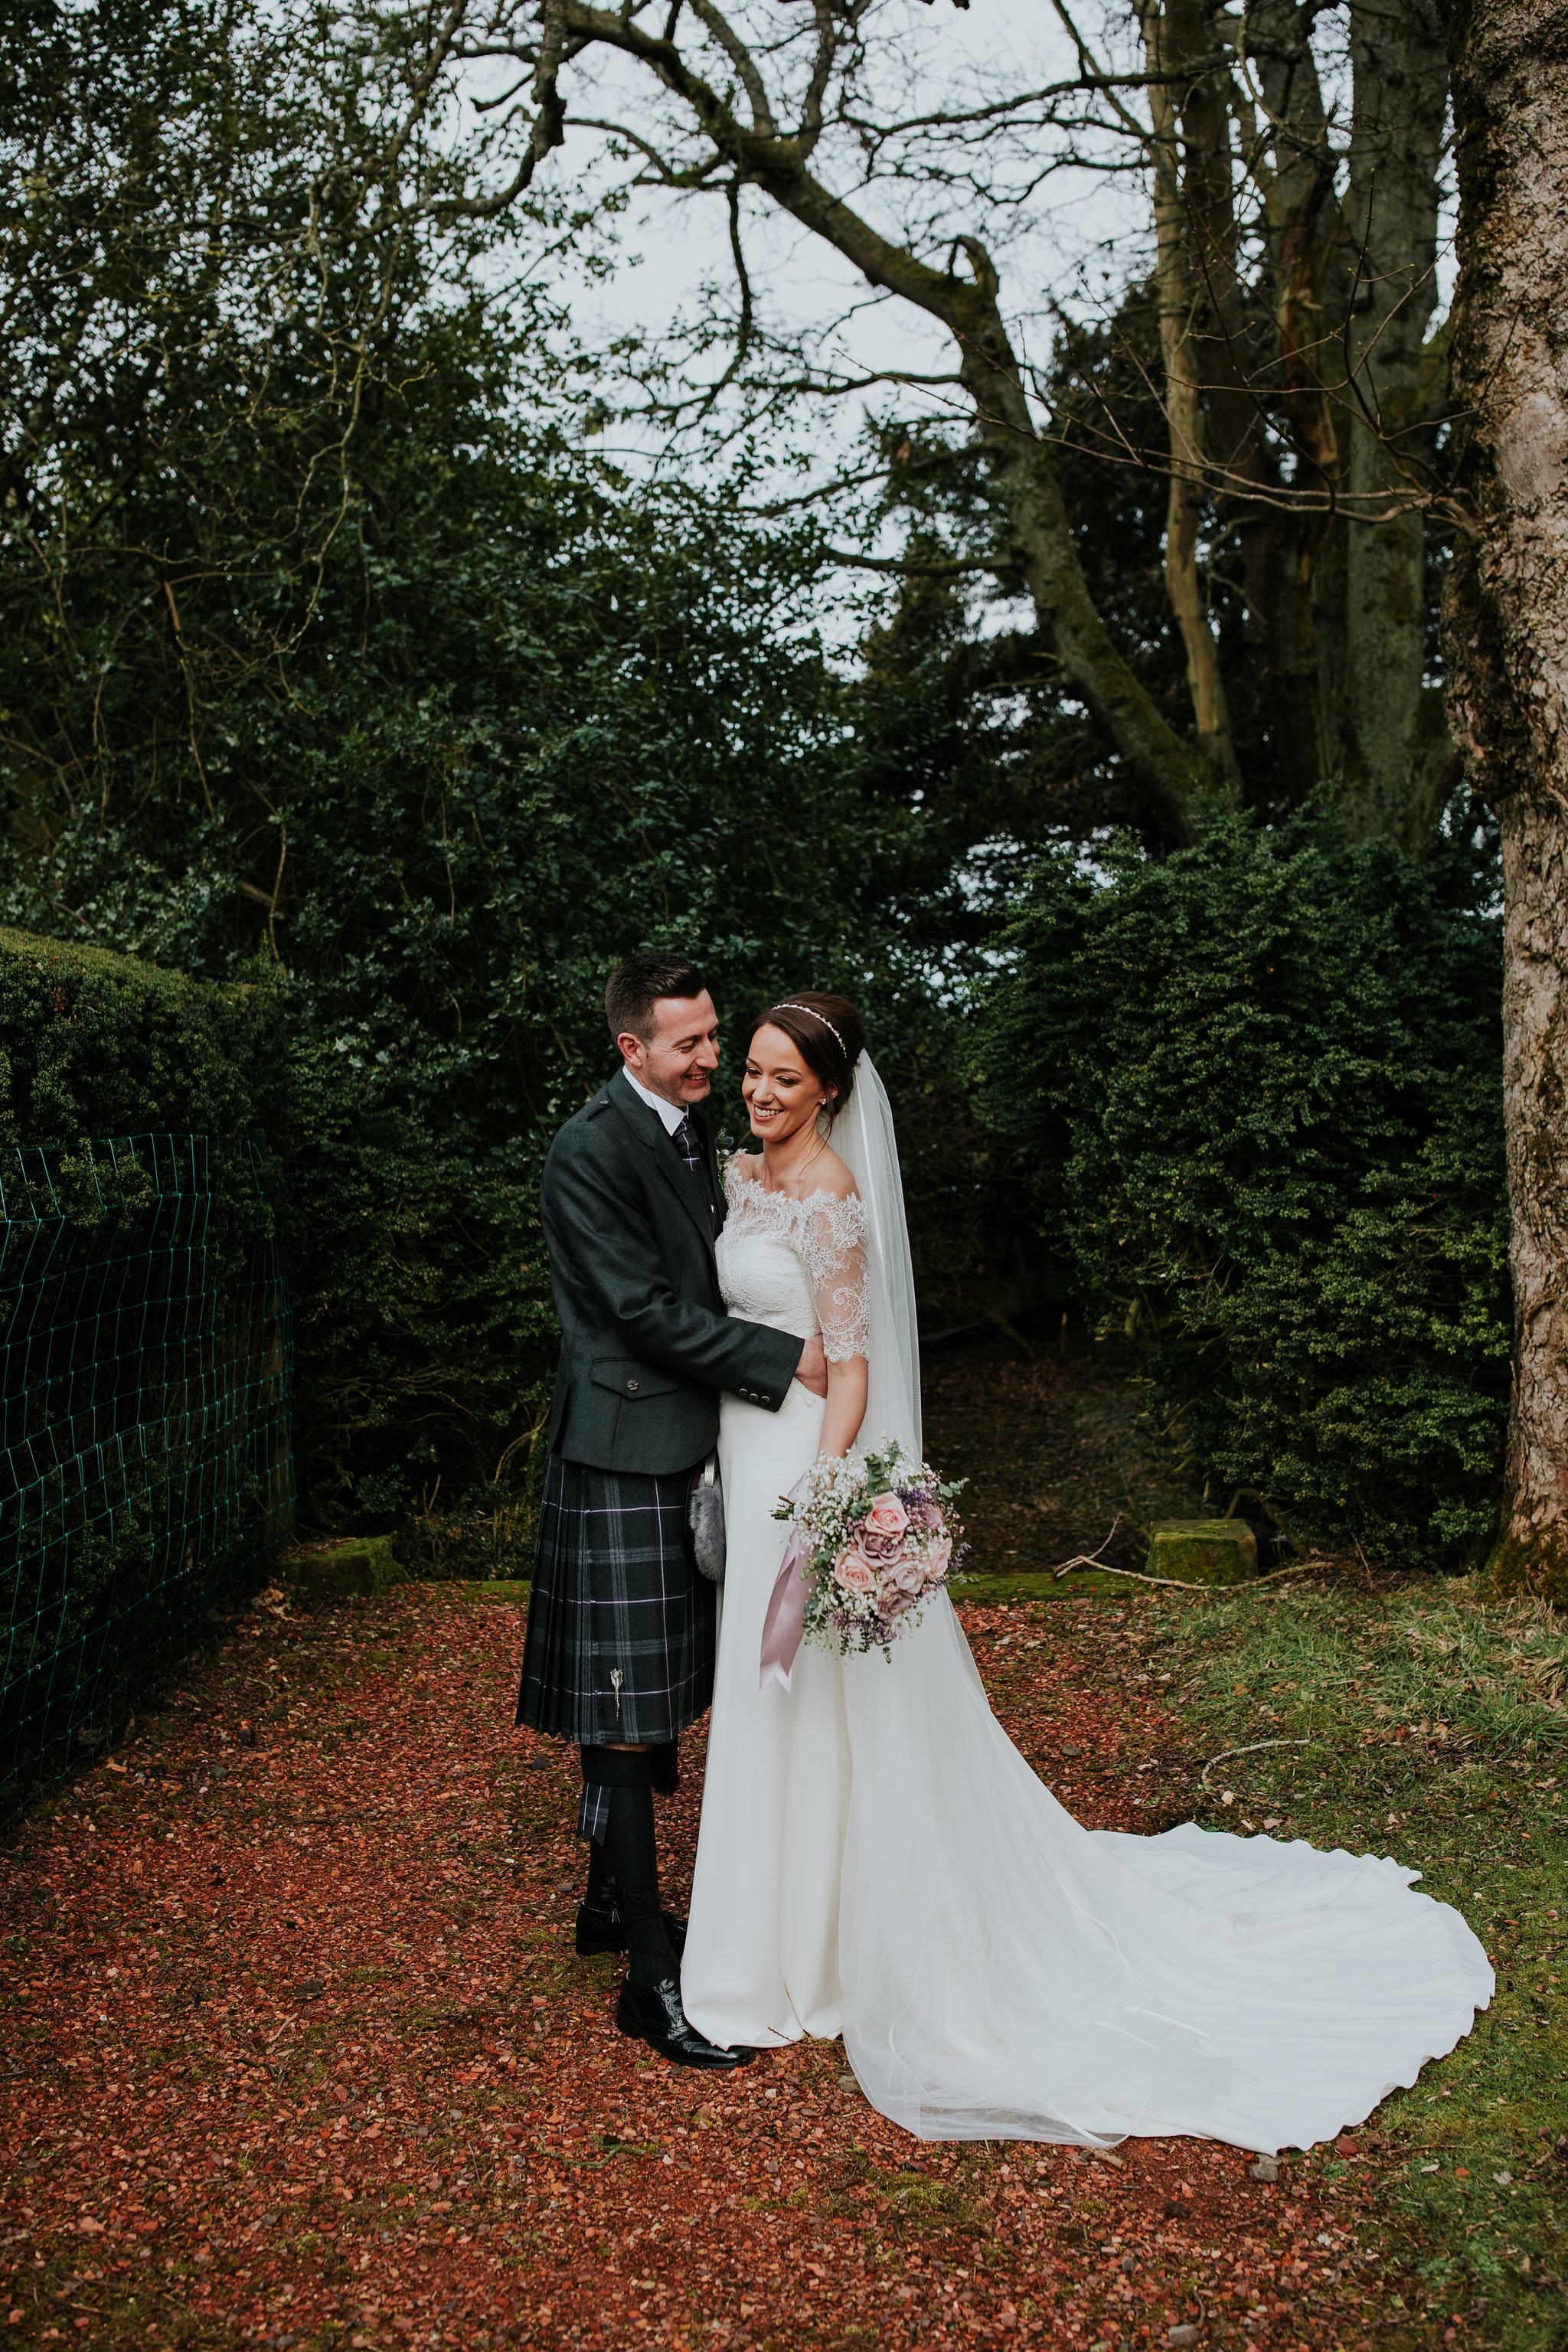 kirknewton stables wedding photographer (52).jpg